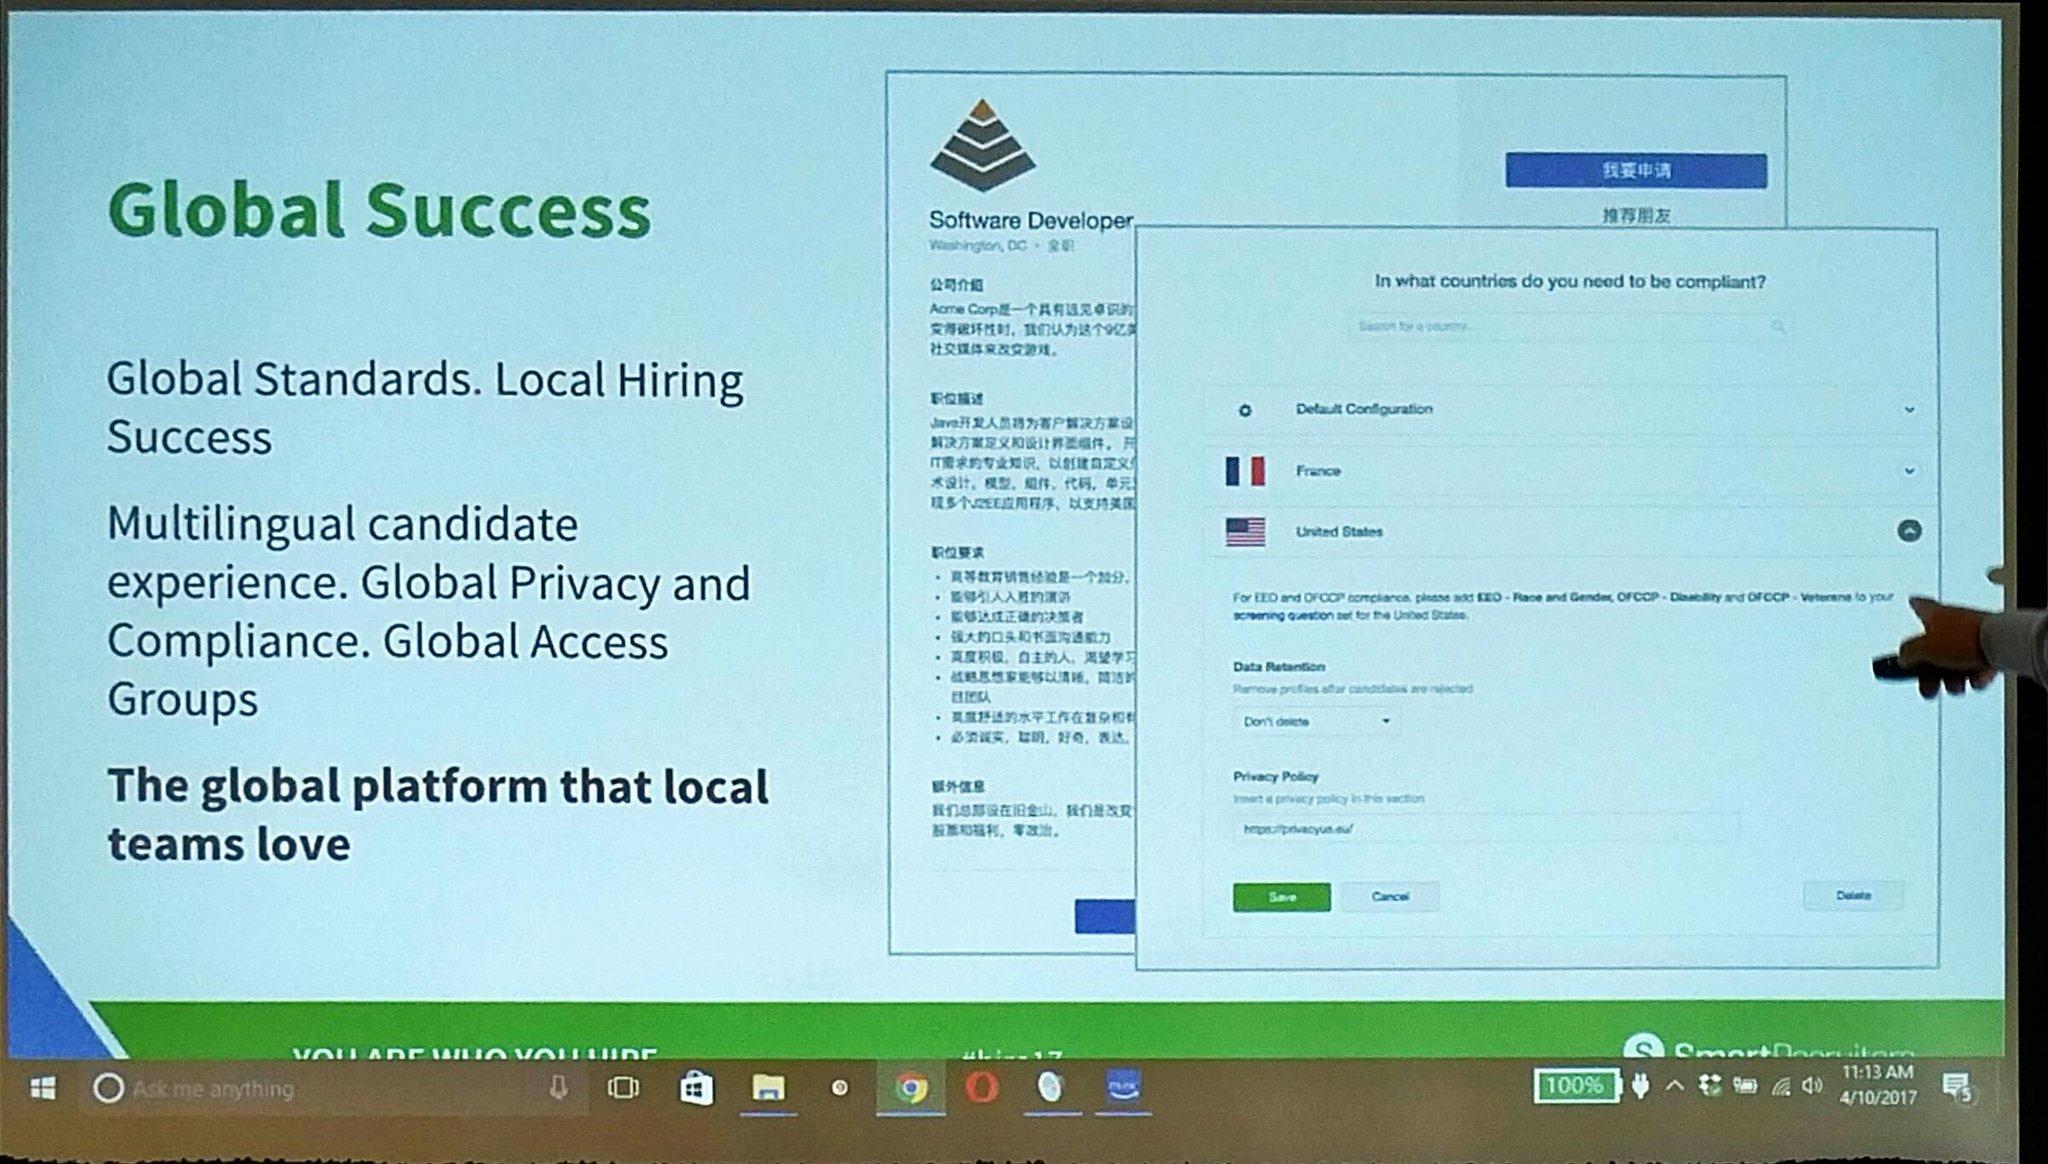 Key new @SmartRecruiters new capabilities - Globalization capabilities - Global Standards -  Lokal Hiring success. #hire17 https://t.co/4PbyO5g1cb